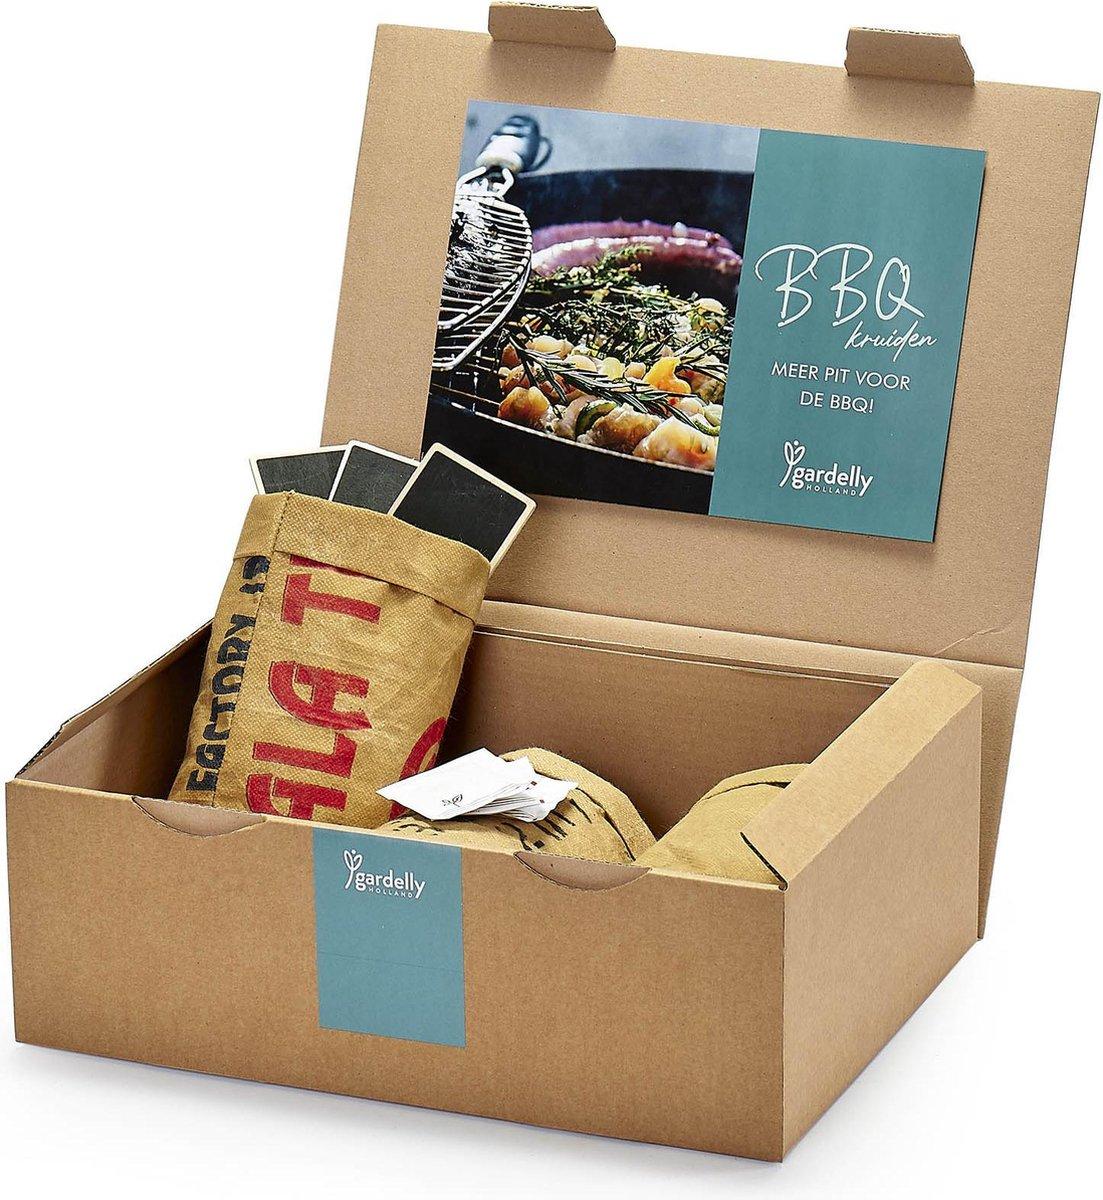 BBQ Kruiden Kweken (3x Kruidenzaden, Stekers en Potgrond | Gardelly)